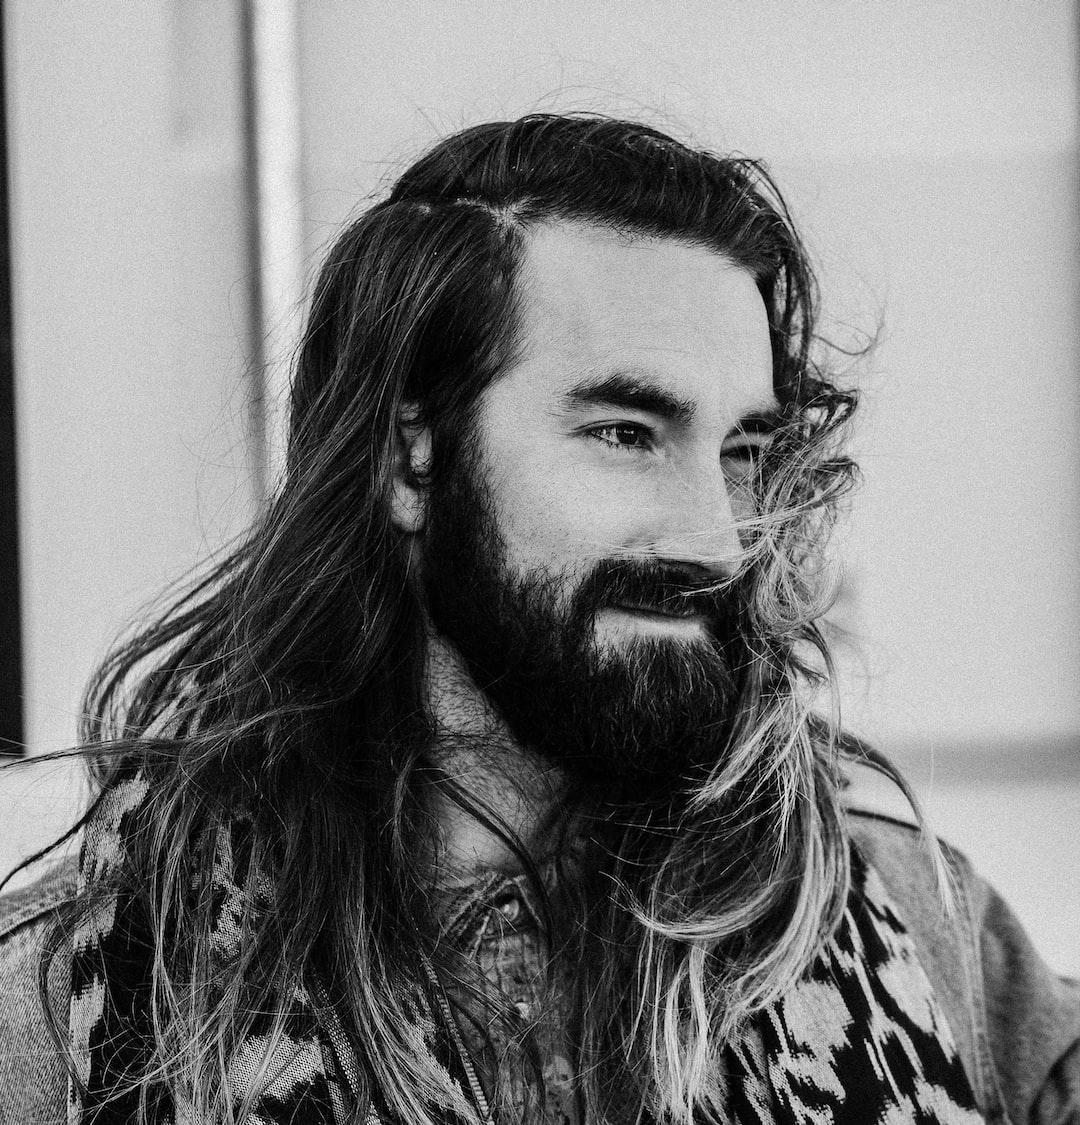 monochrome bearded man